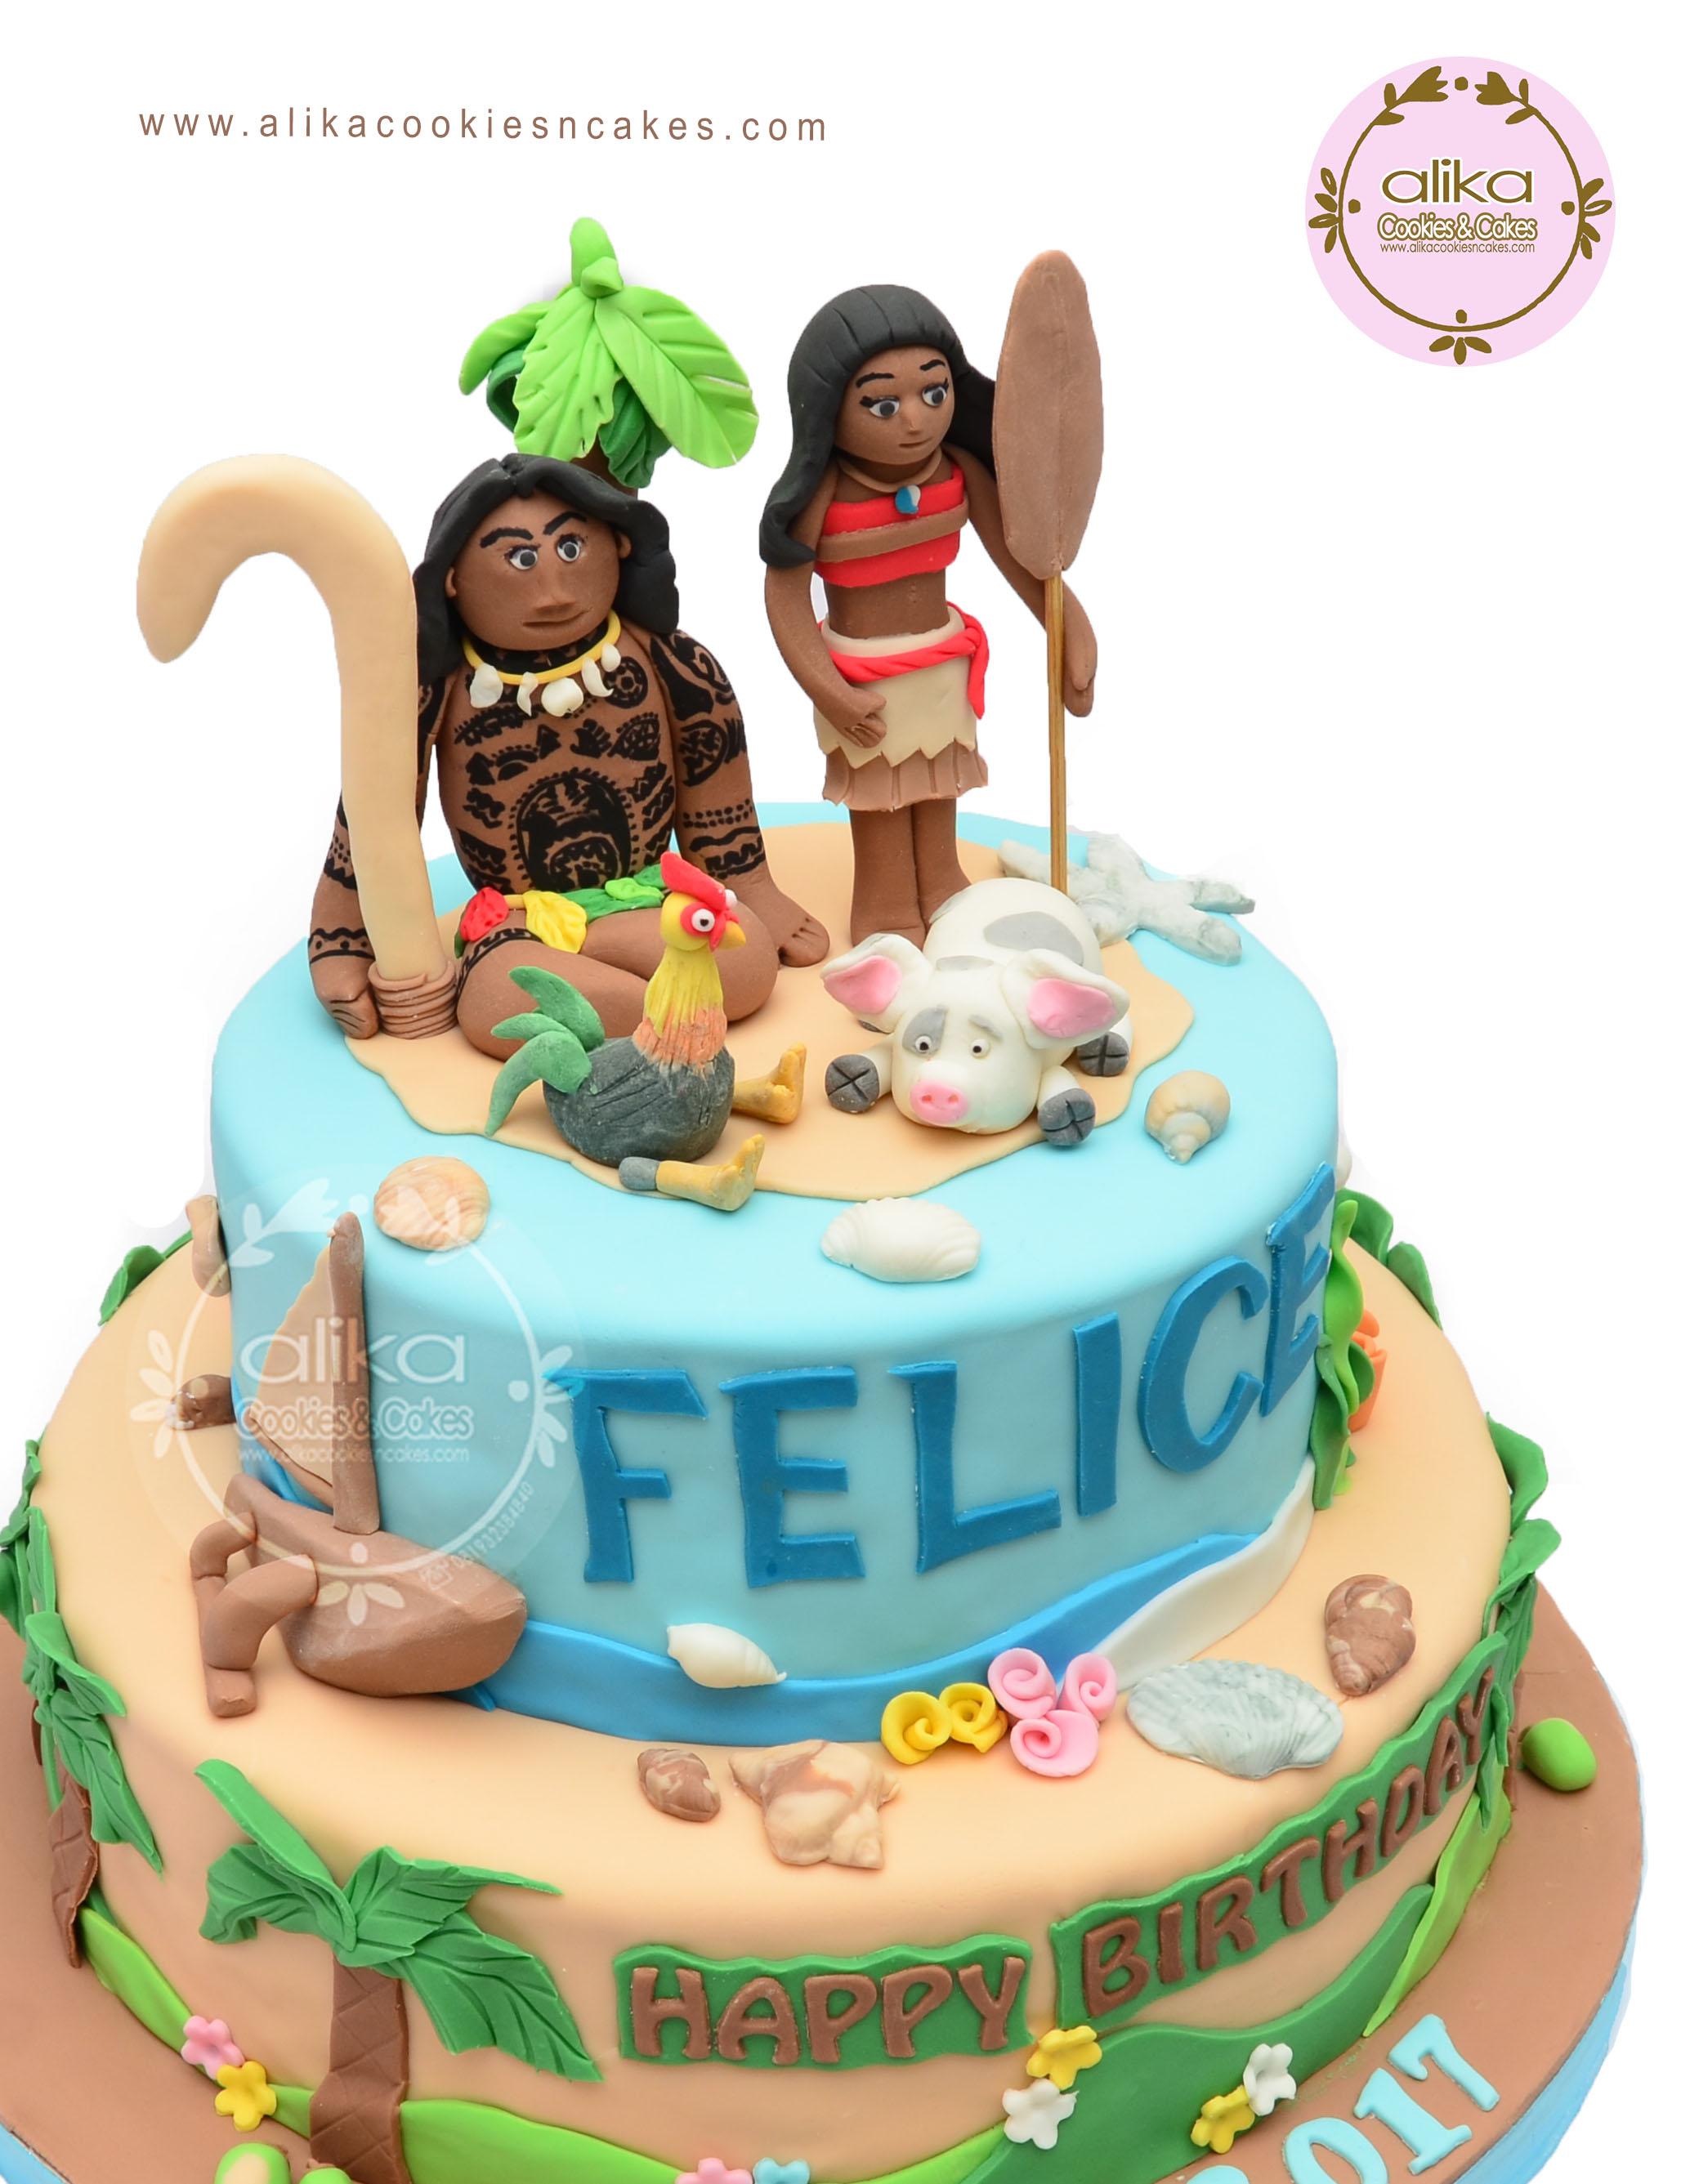 Cake Fondant Alikacookiesncakes